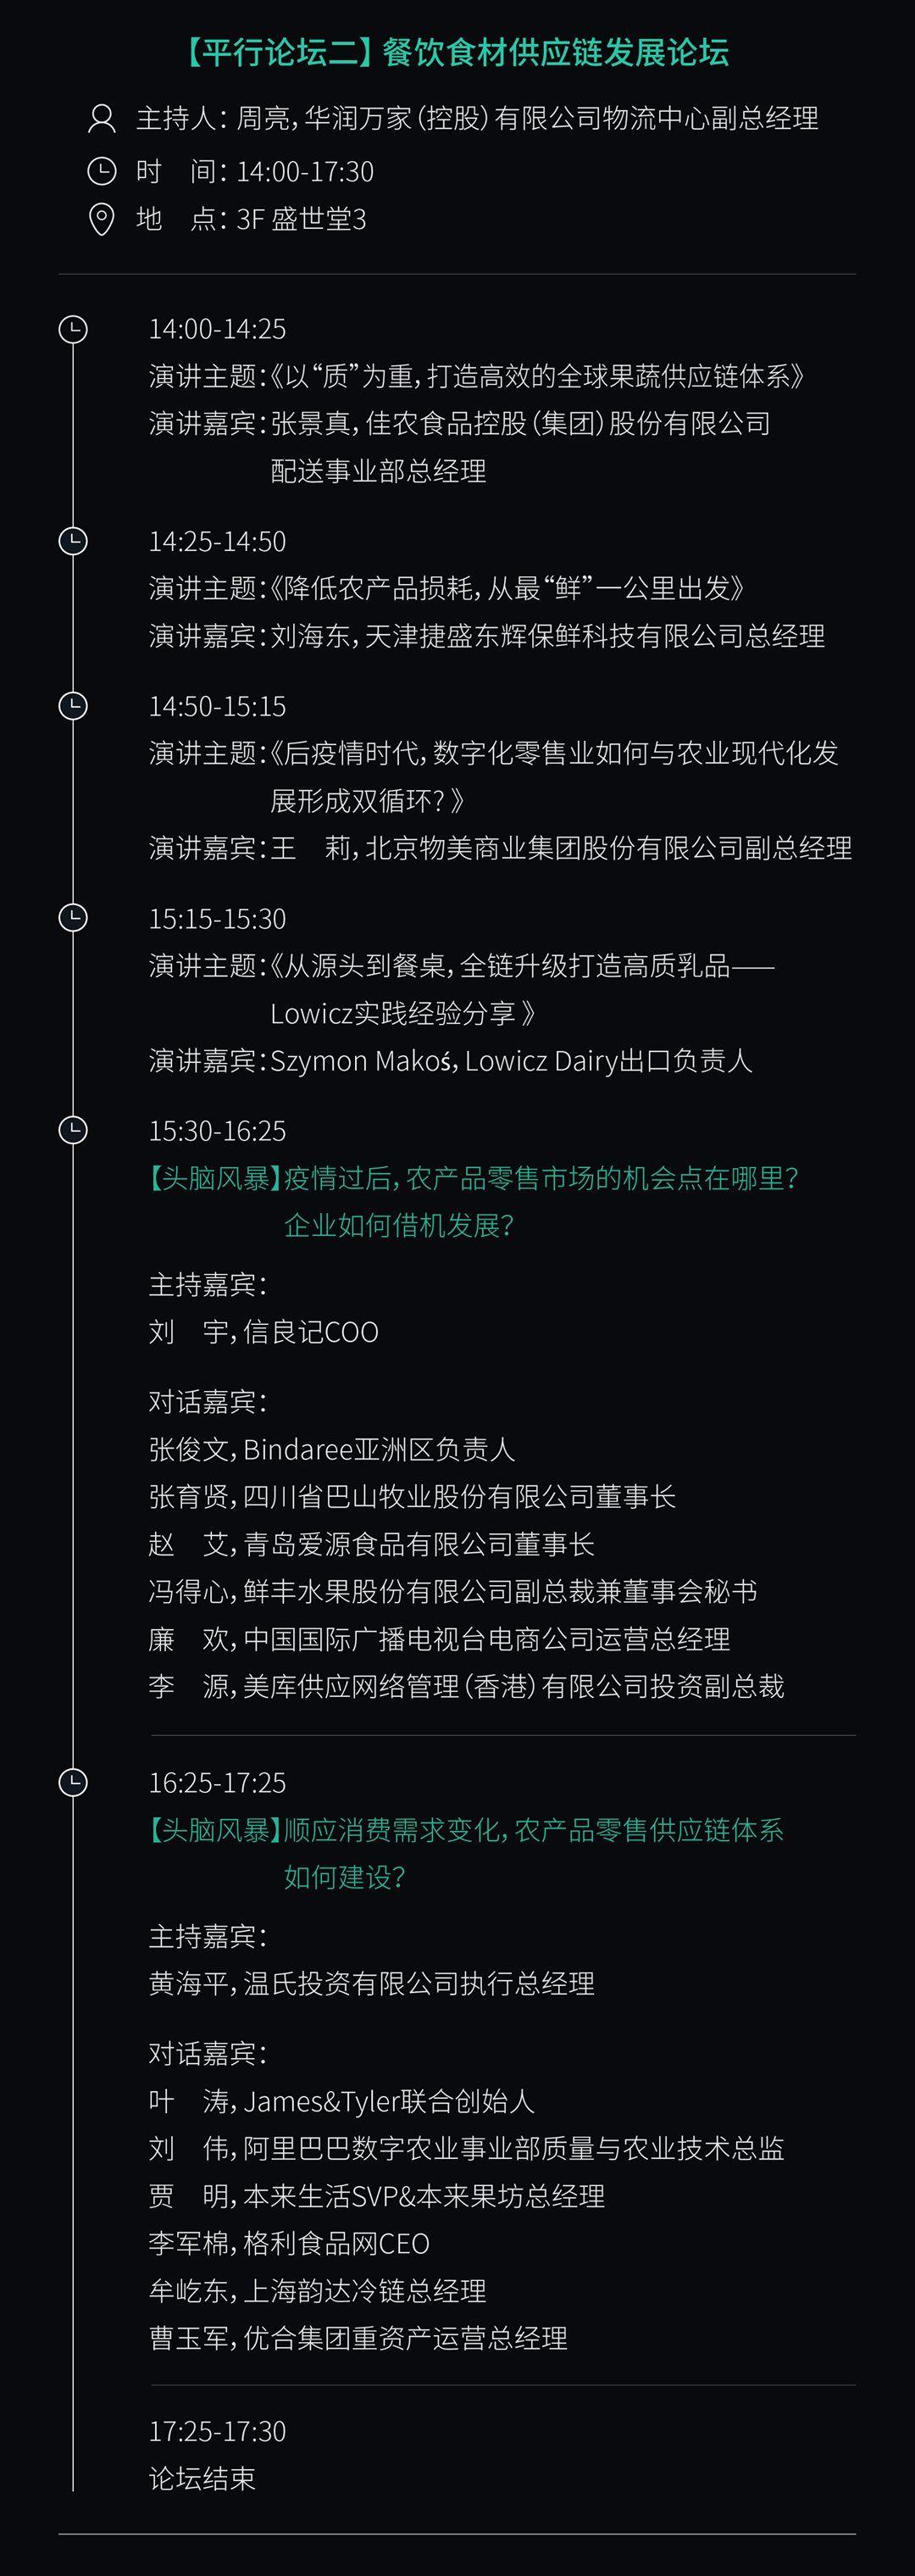 【20210511】议程长图_画板-1_05.png